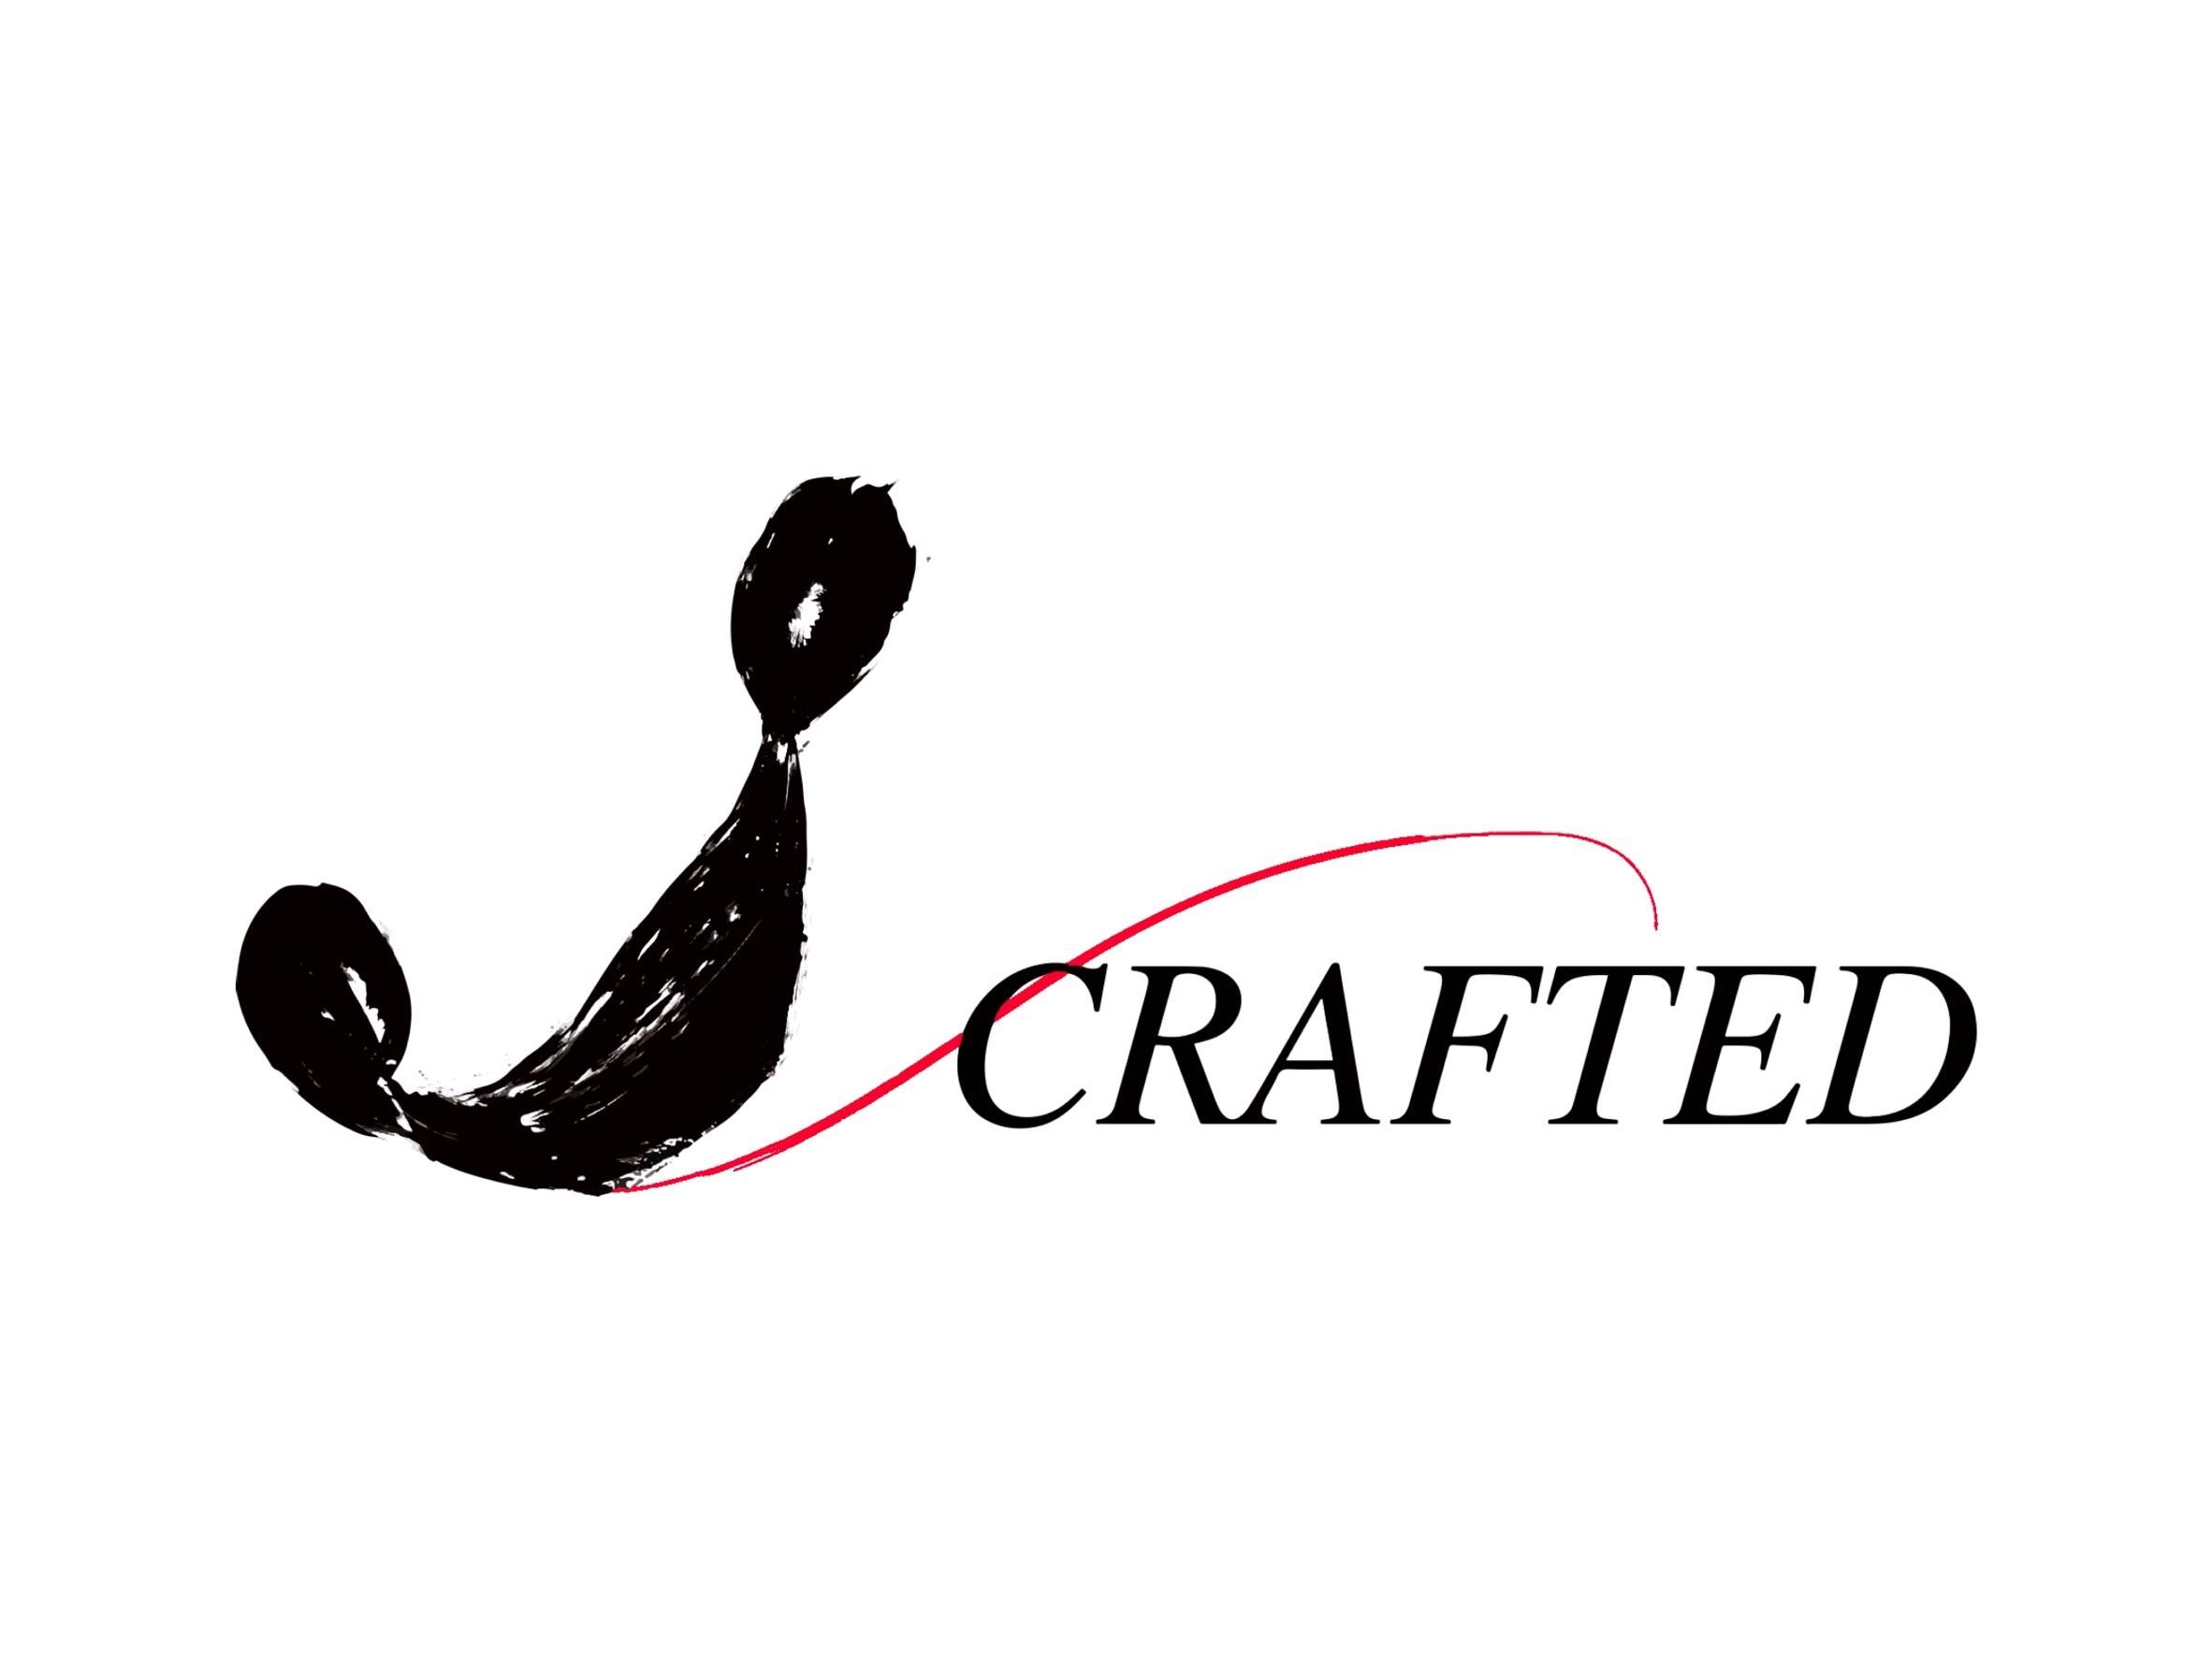 J-CRAFTEDのロゴ写真